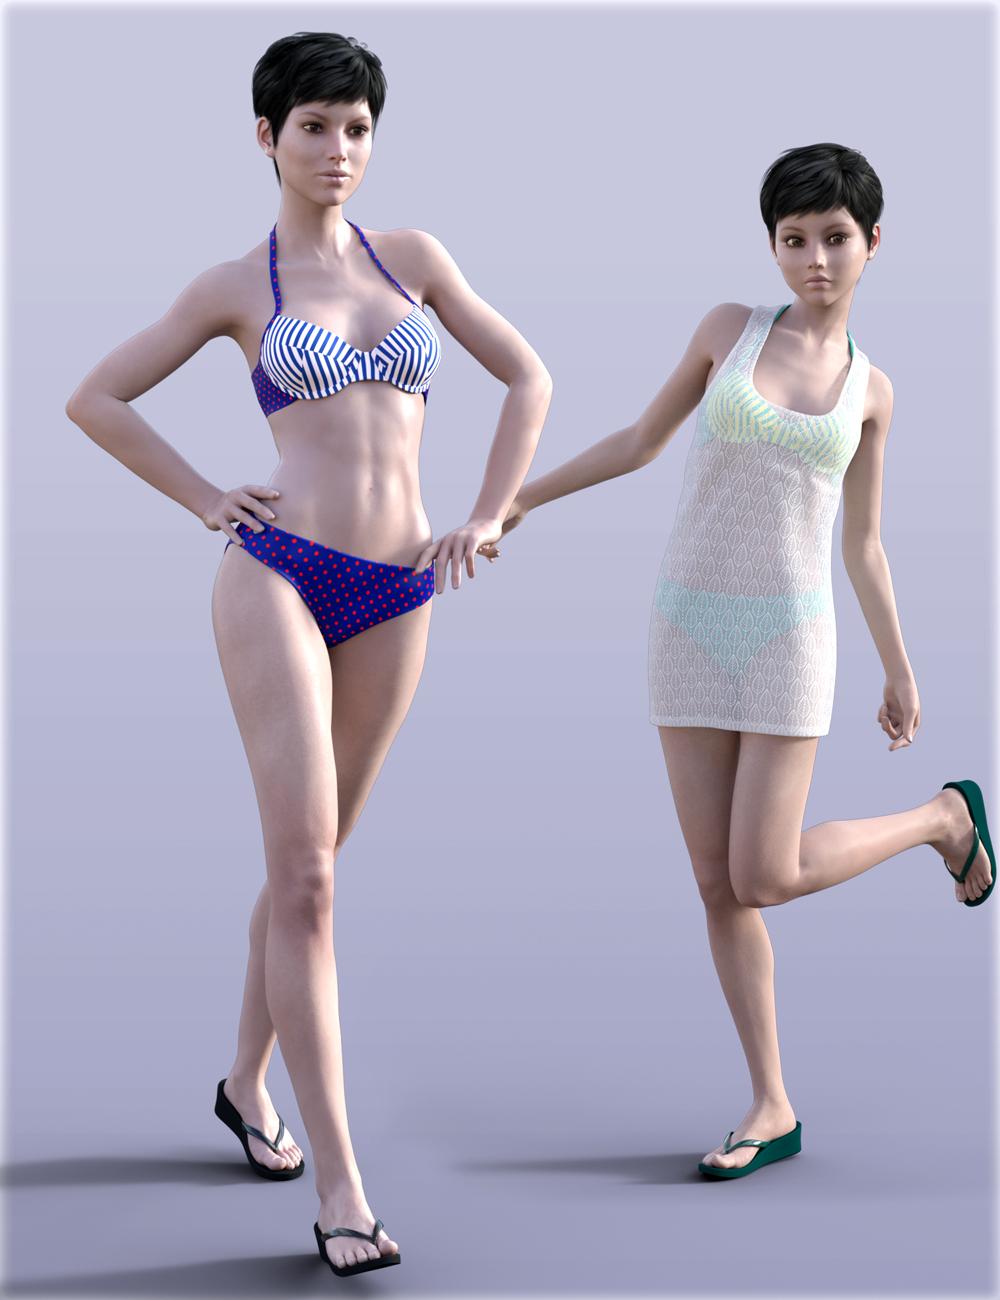 H&C Bikini Set for Genesis 3 Female(s) by: IH Kang, 3D Models by Daz 3D